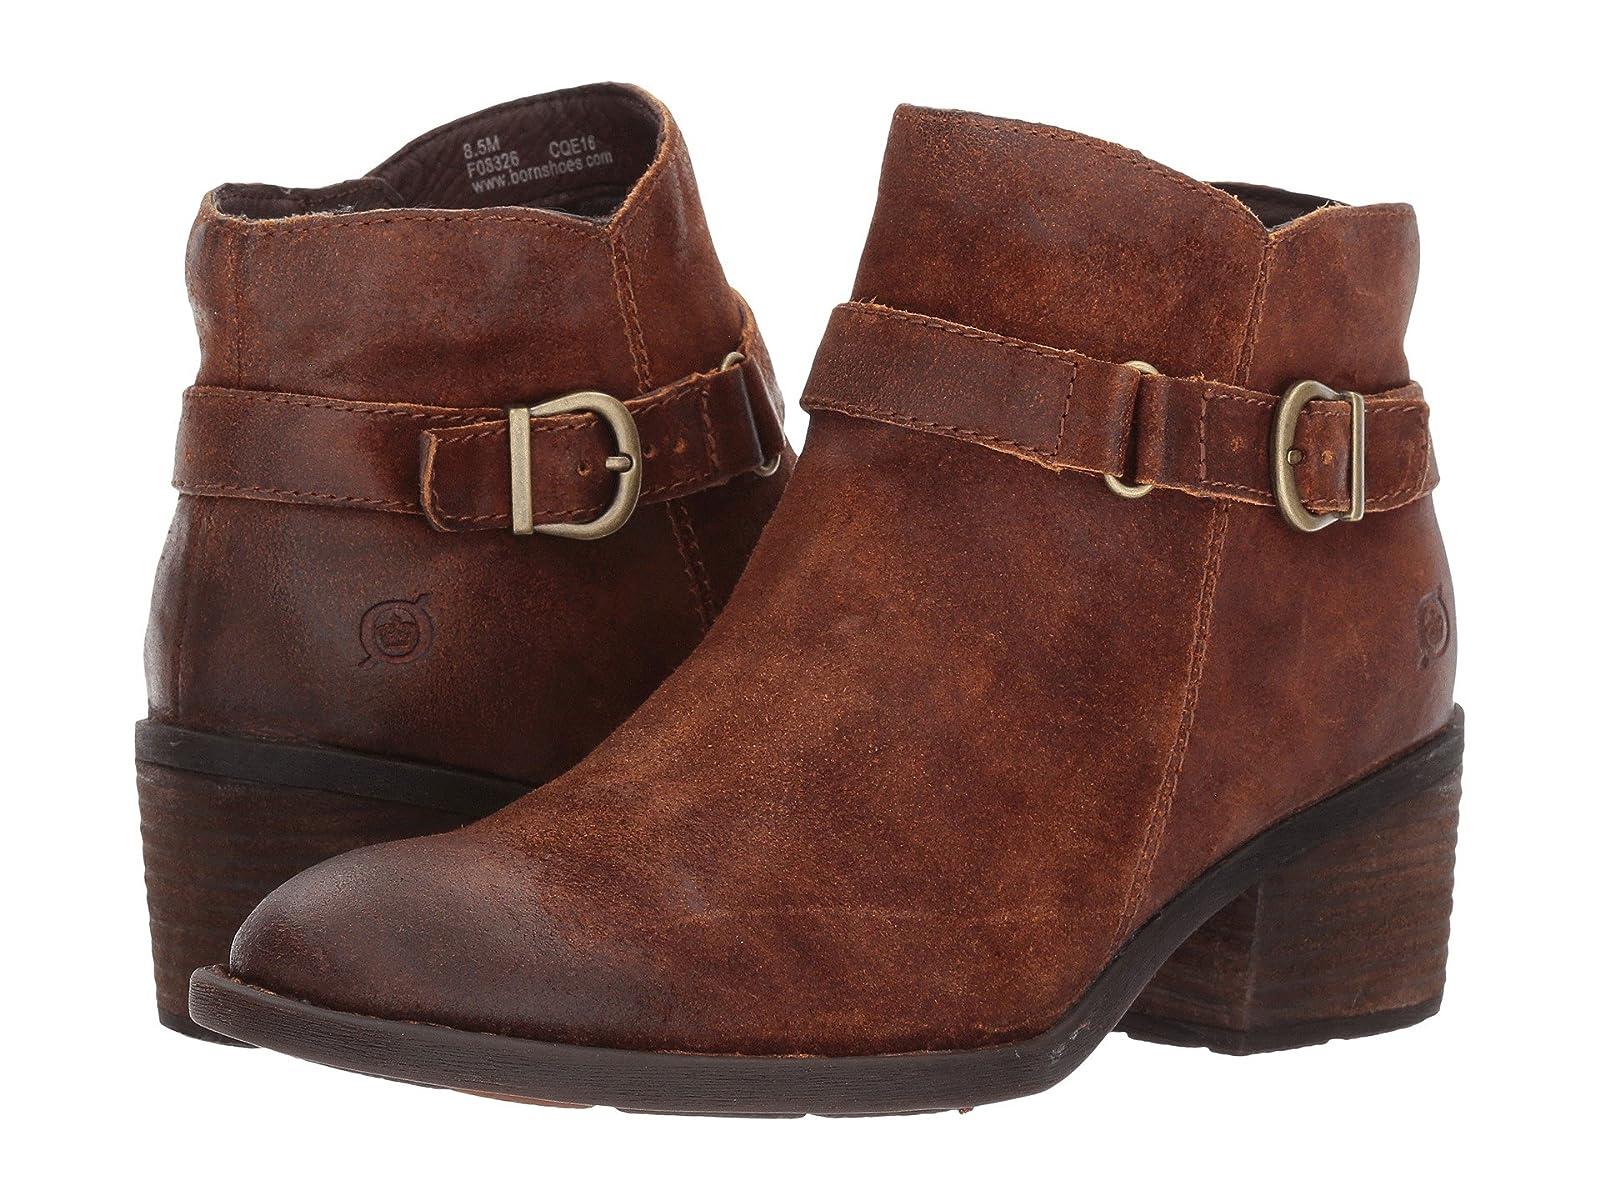 Born AdiaCheap and distinctive eye-catching shoes